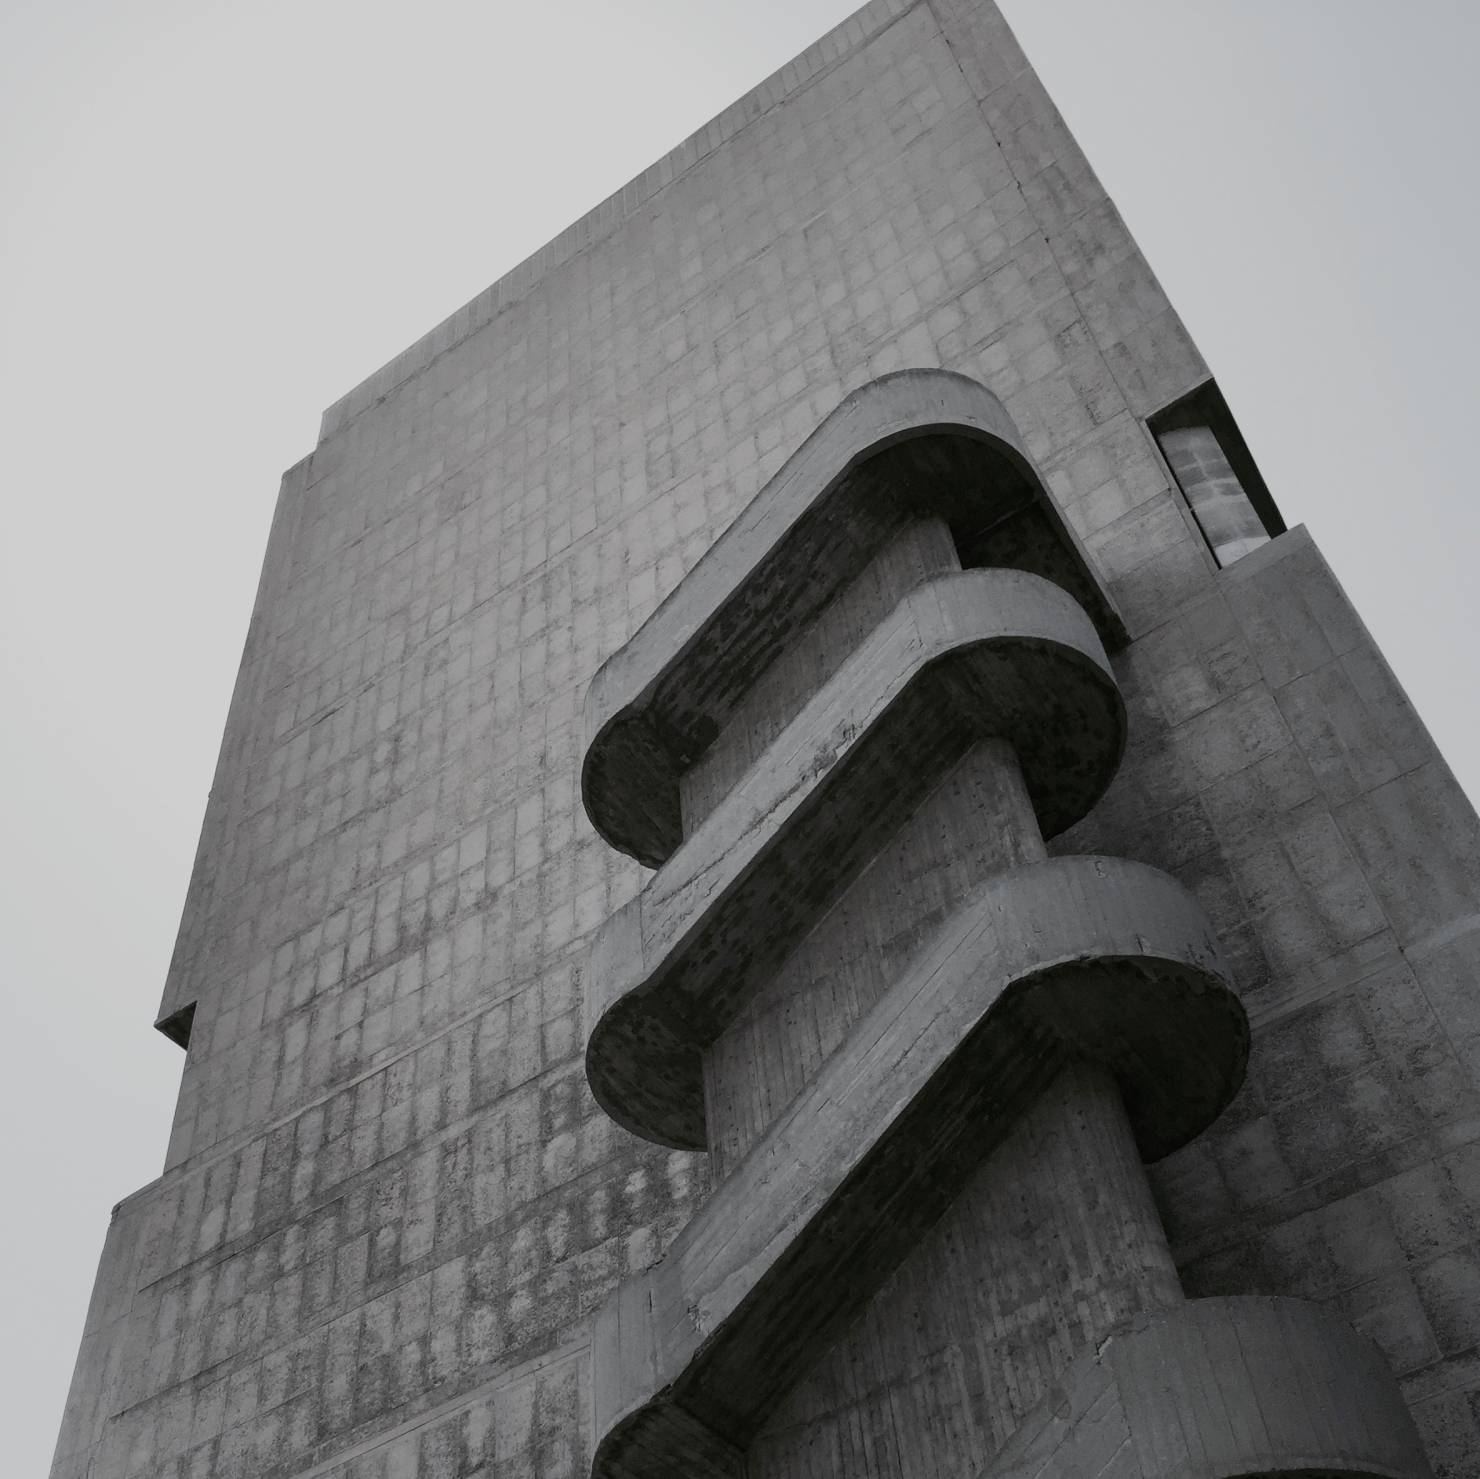 le_corbusier_unite_d-habitation_marseille_patrick_schuttler_001-6c37fd41f4a7db289365355b82812628